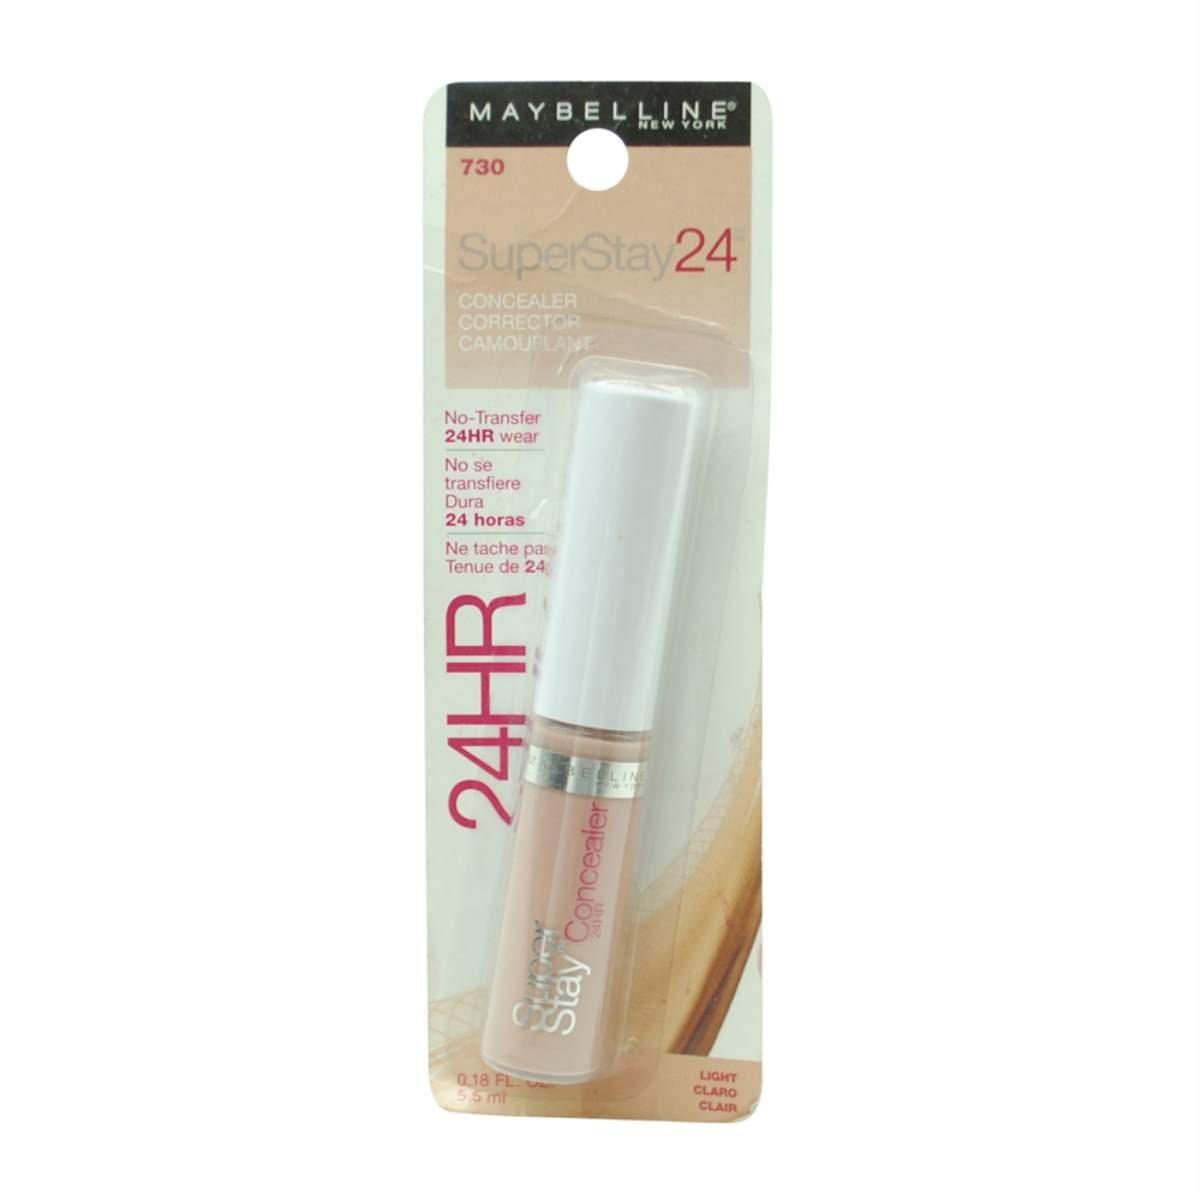 (Pack 2) Maybelline New York Super Stay 24Hr Concealer, Light 730, 0.18 Fluid Ounce